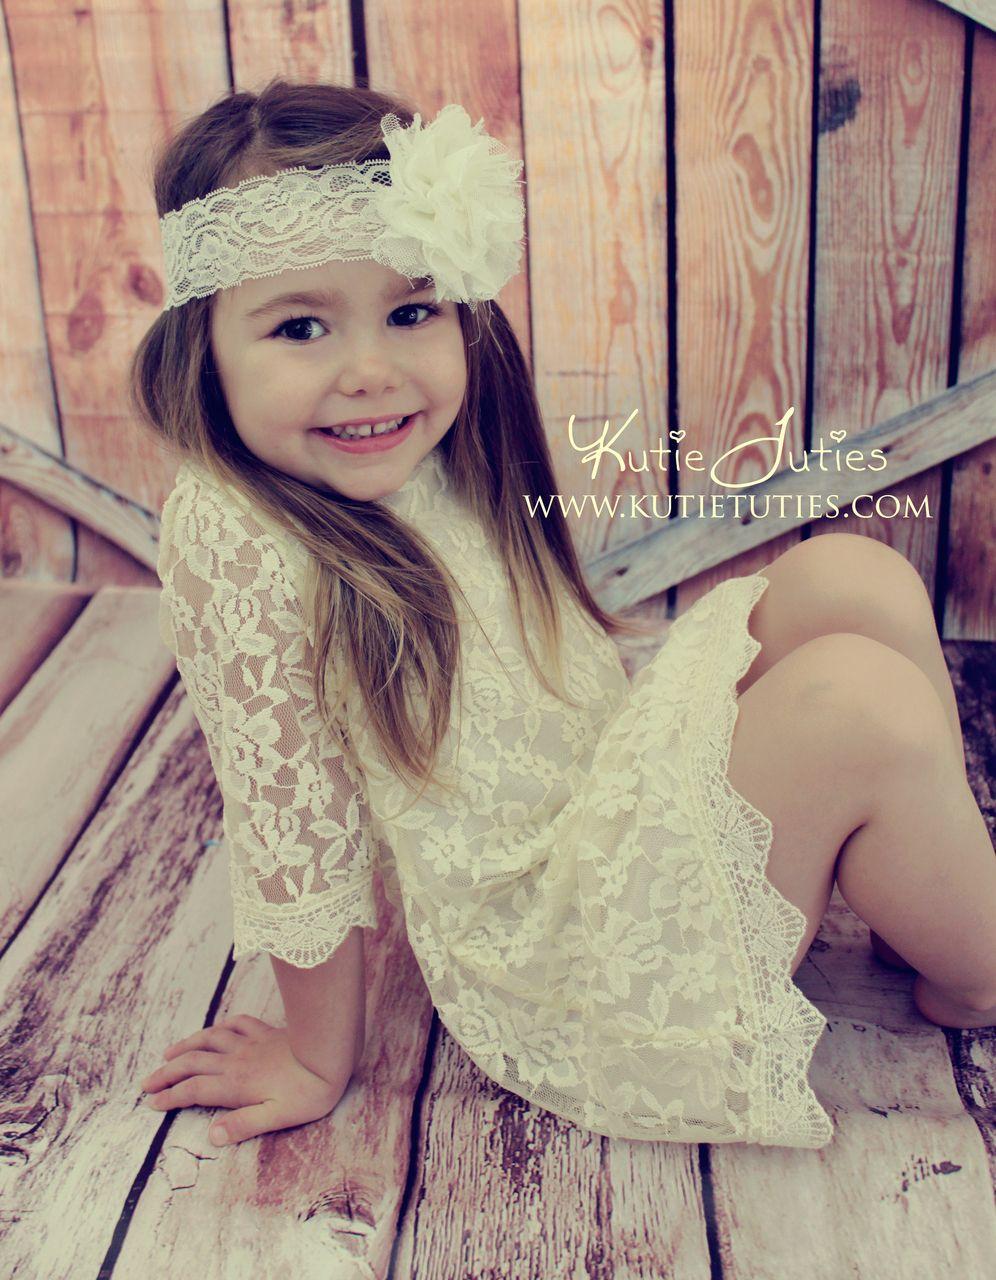 Kutie tuties lace dress flower girl dress wedding rustic